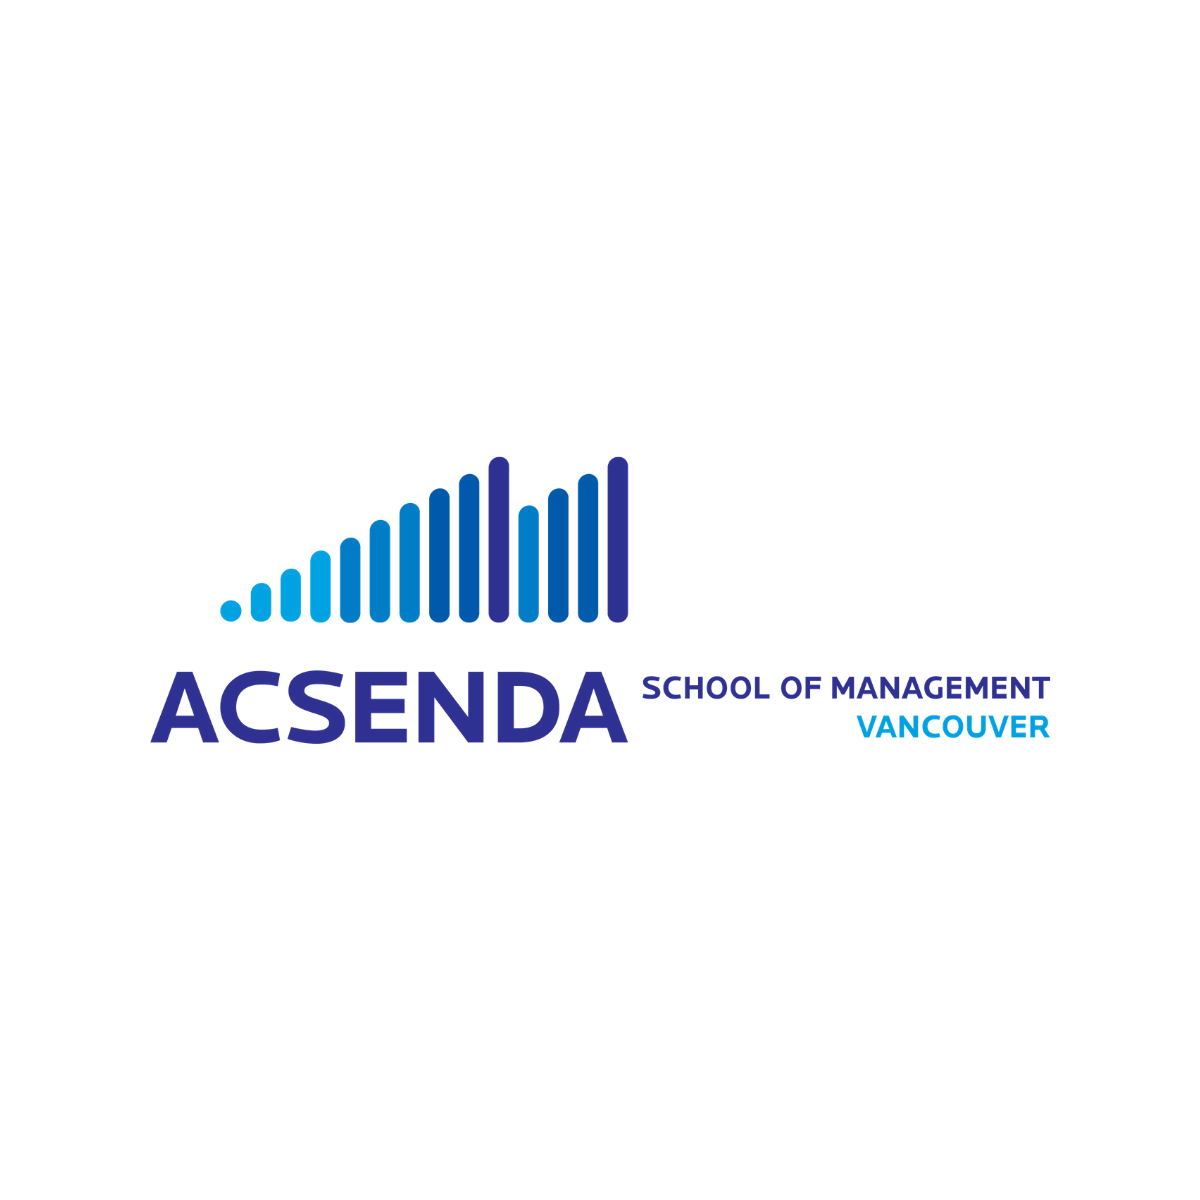 Acsenda School of Management Logo Image